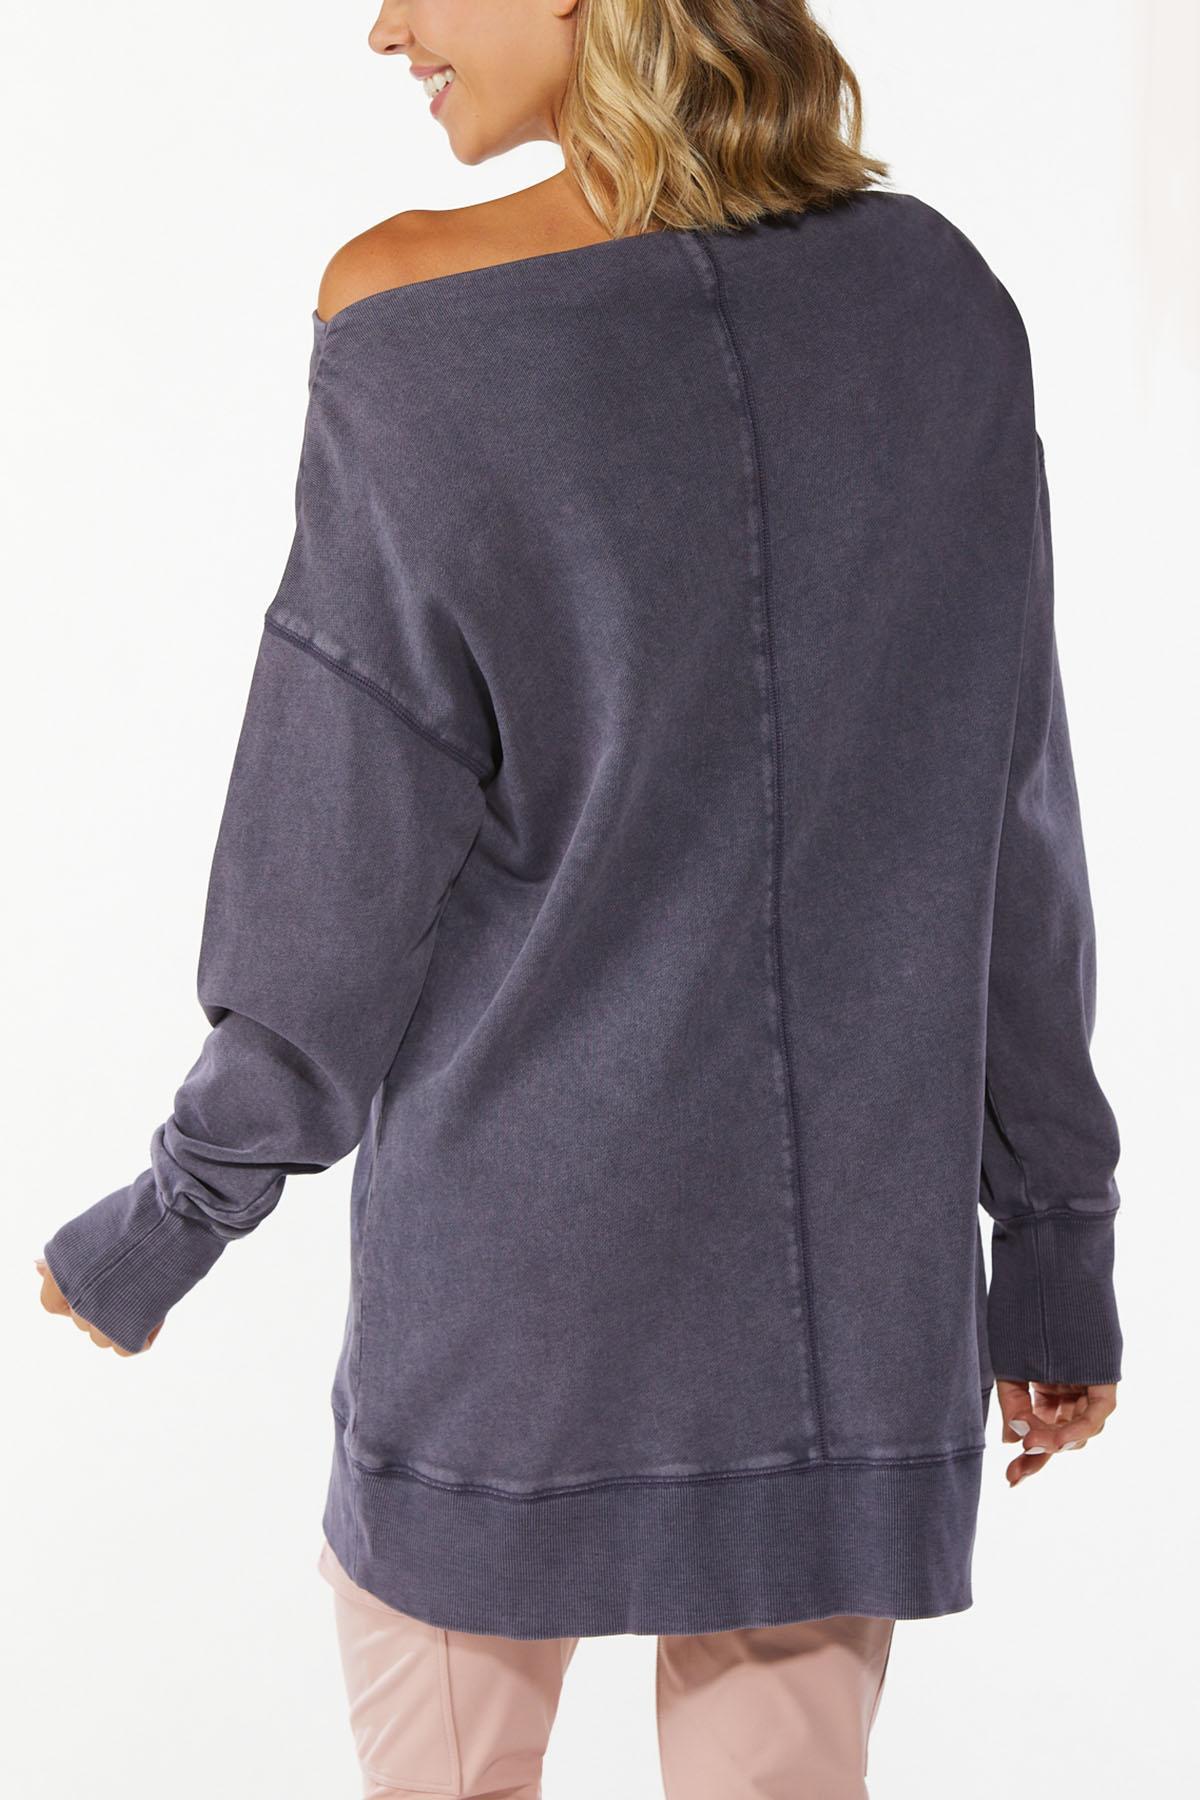 Slouch Oversized Sweatshirt (Item #44698273)